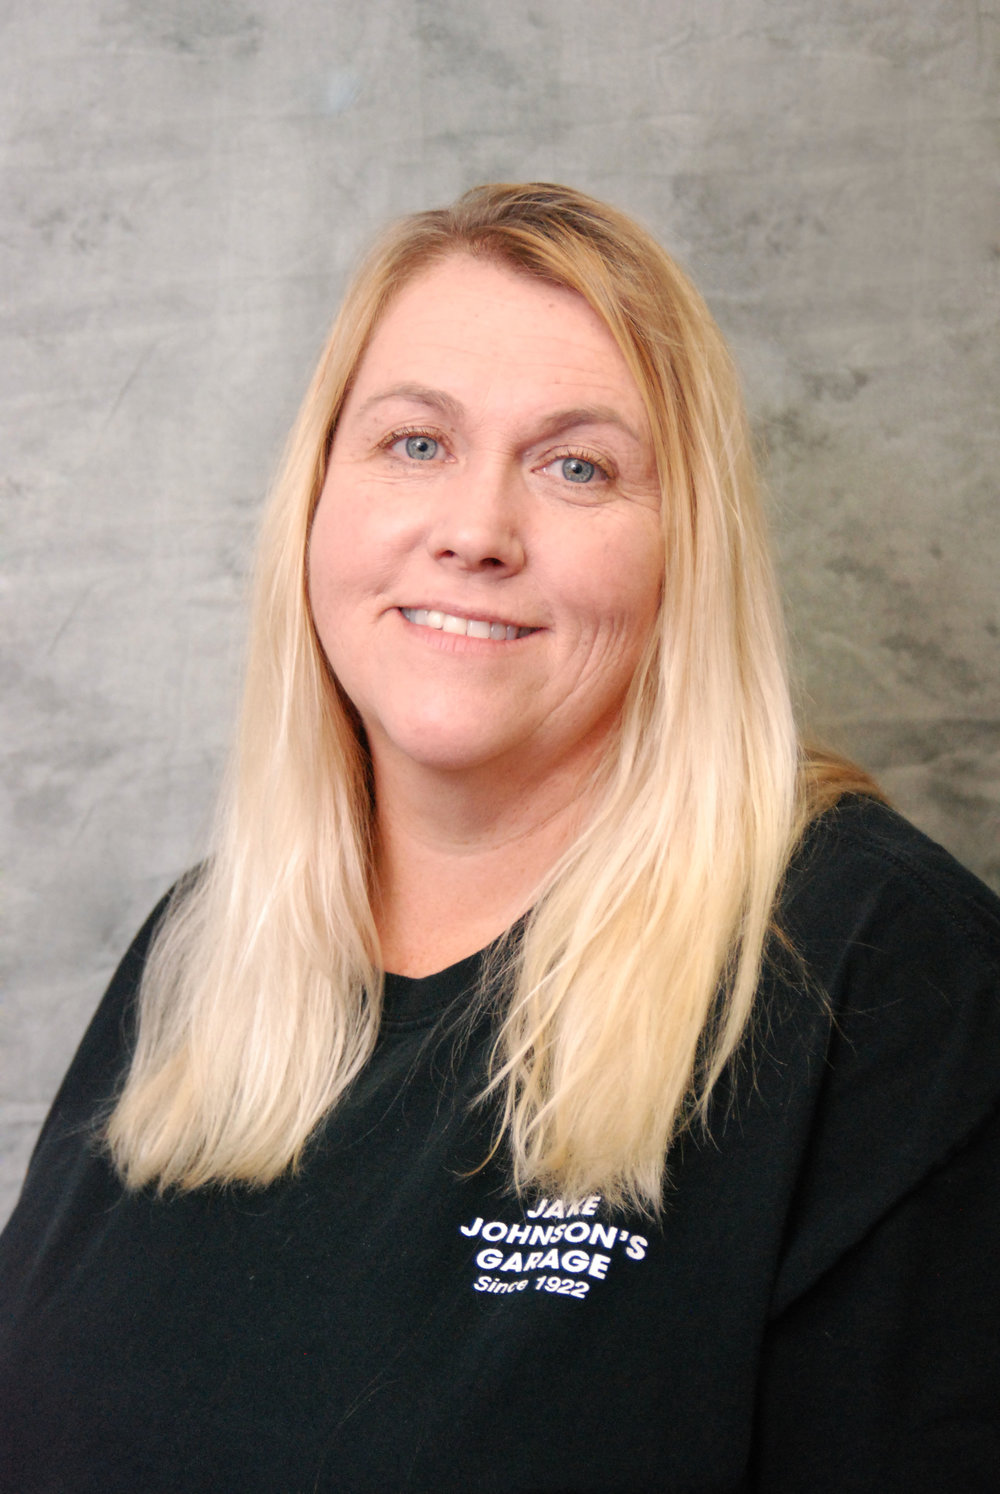 Brenda Johnson - HR / Emissions Manager